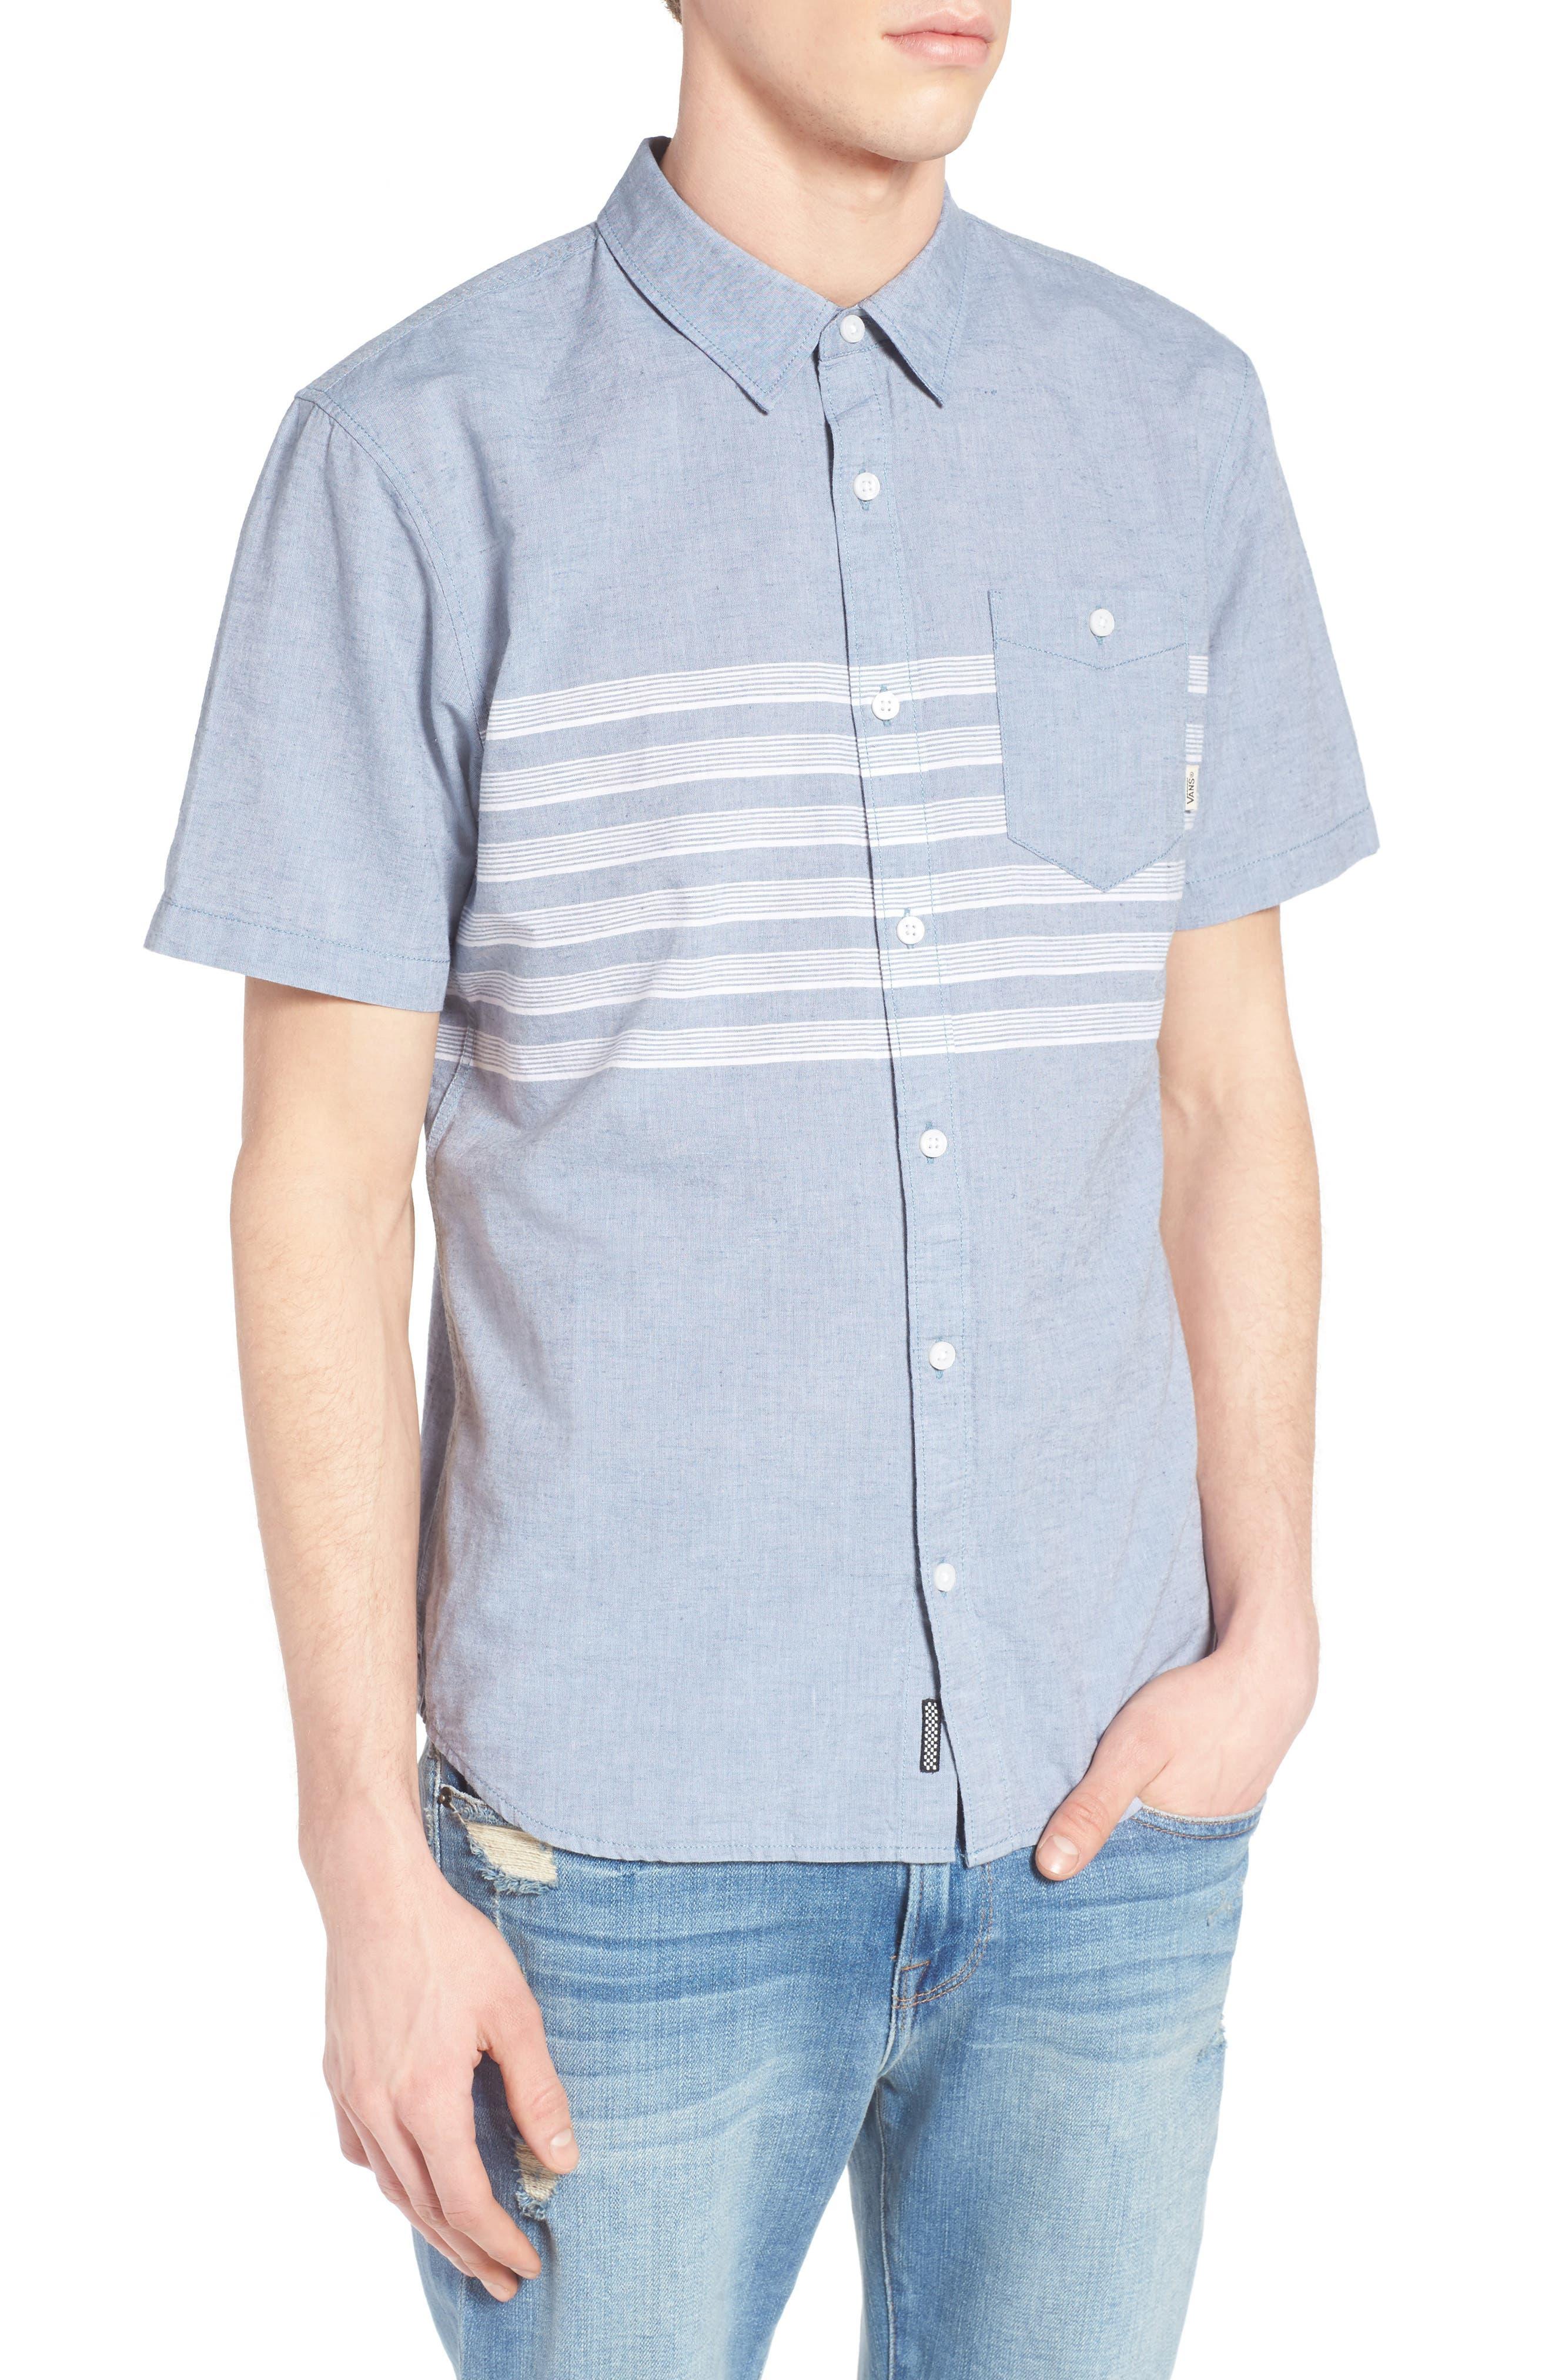 Vans Wallace Stripe Chambray Shirt